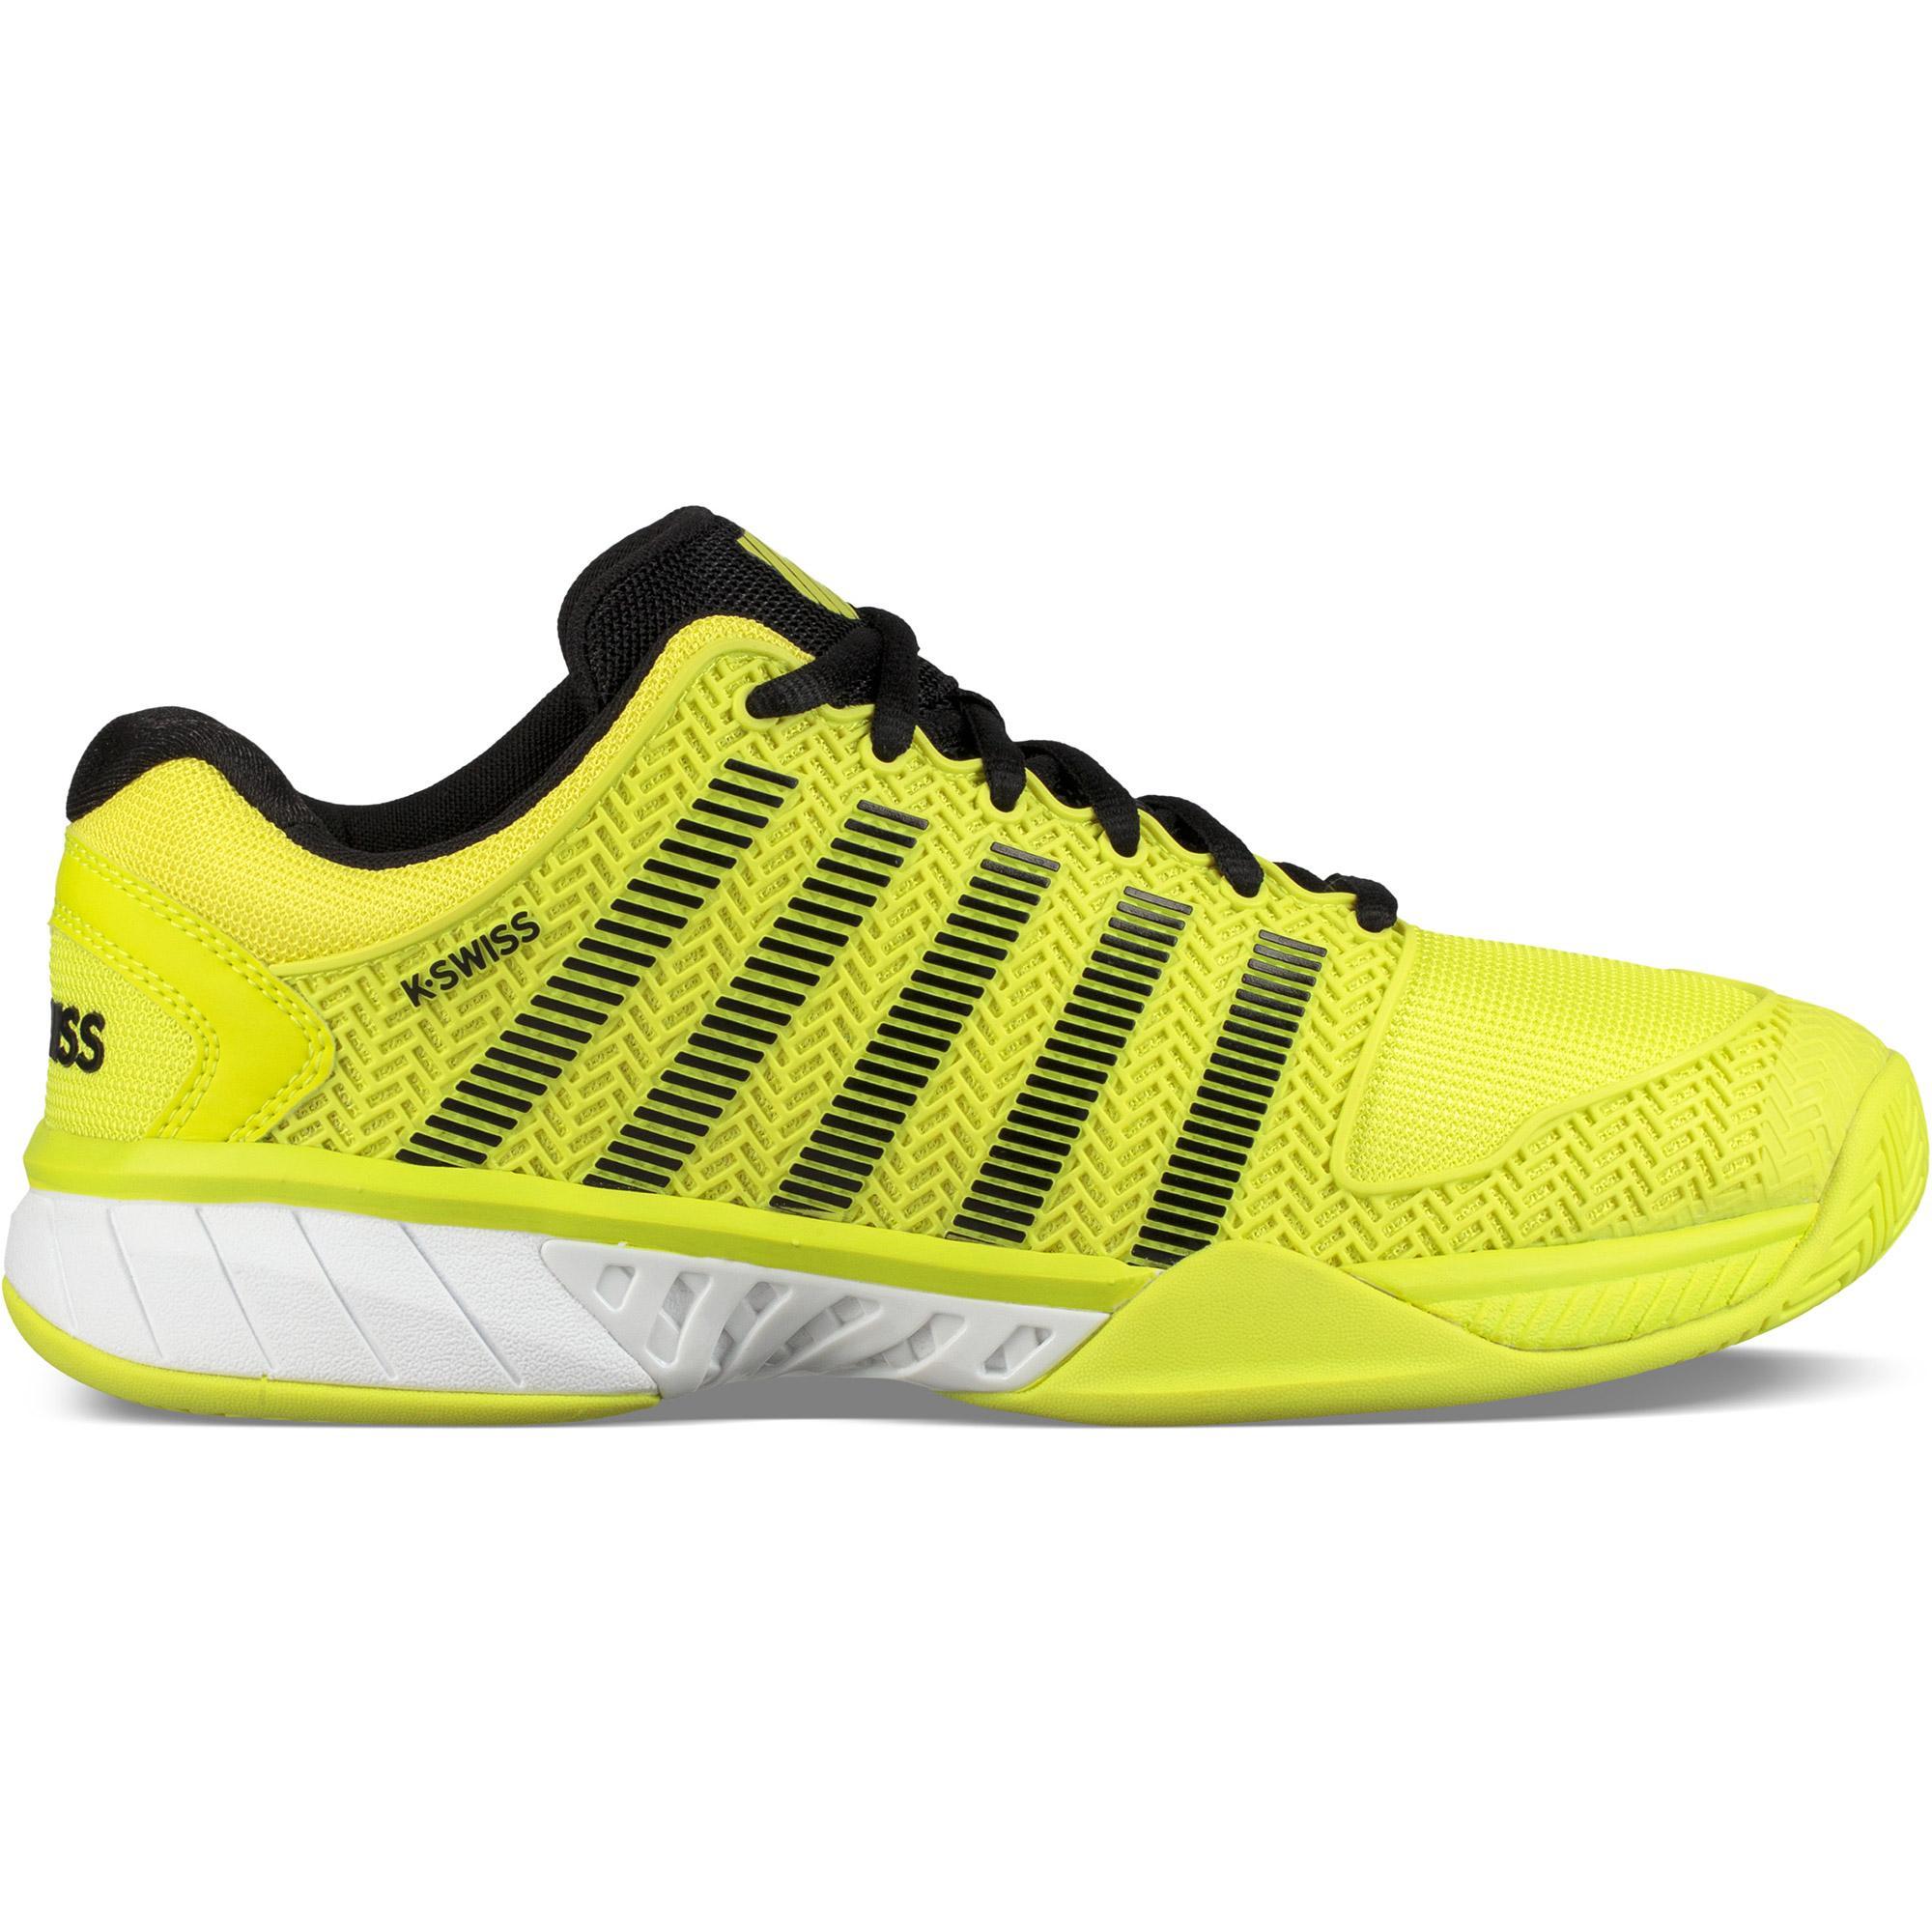 newest 9c9f4 815bc K-Swiss Mens Hypercourt Express HB Tennis Shoes - Neon Yellow Black -  Tennisnuts.com